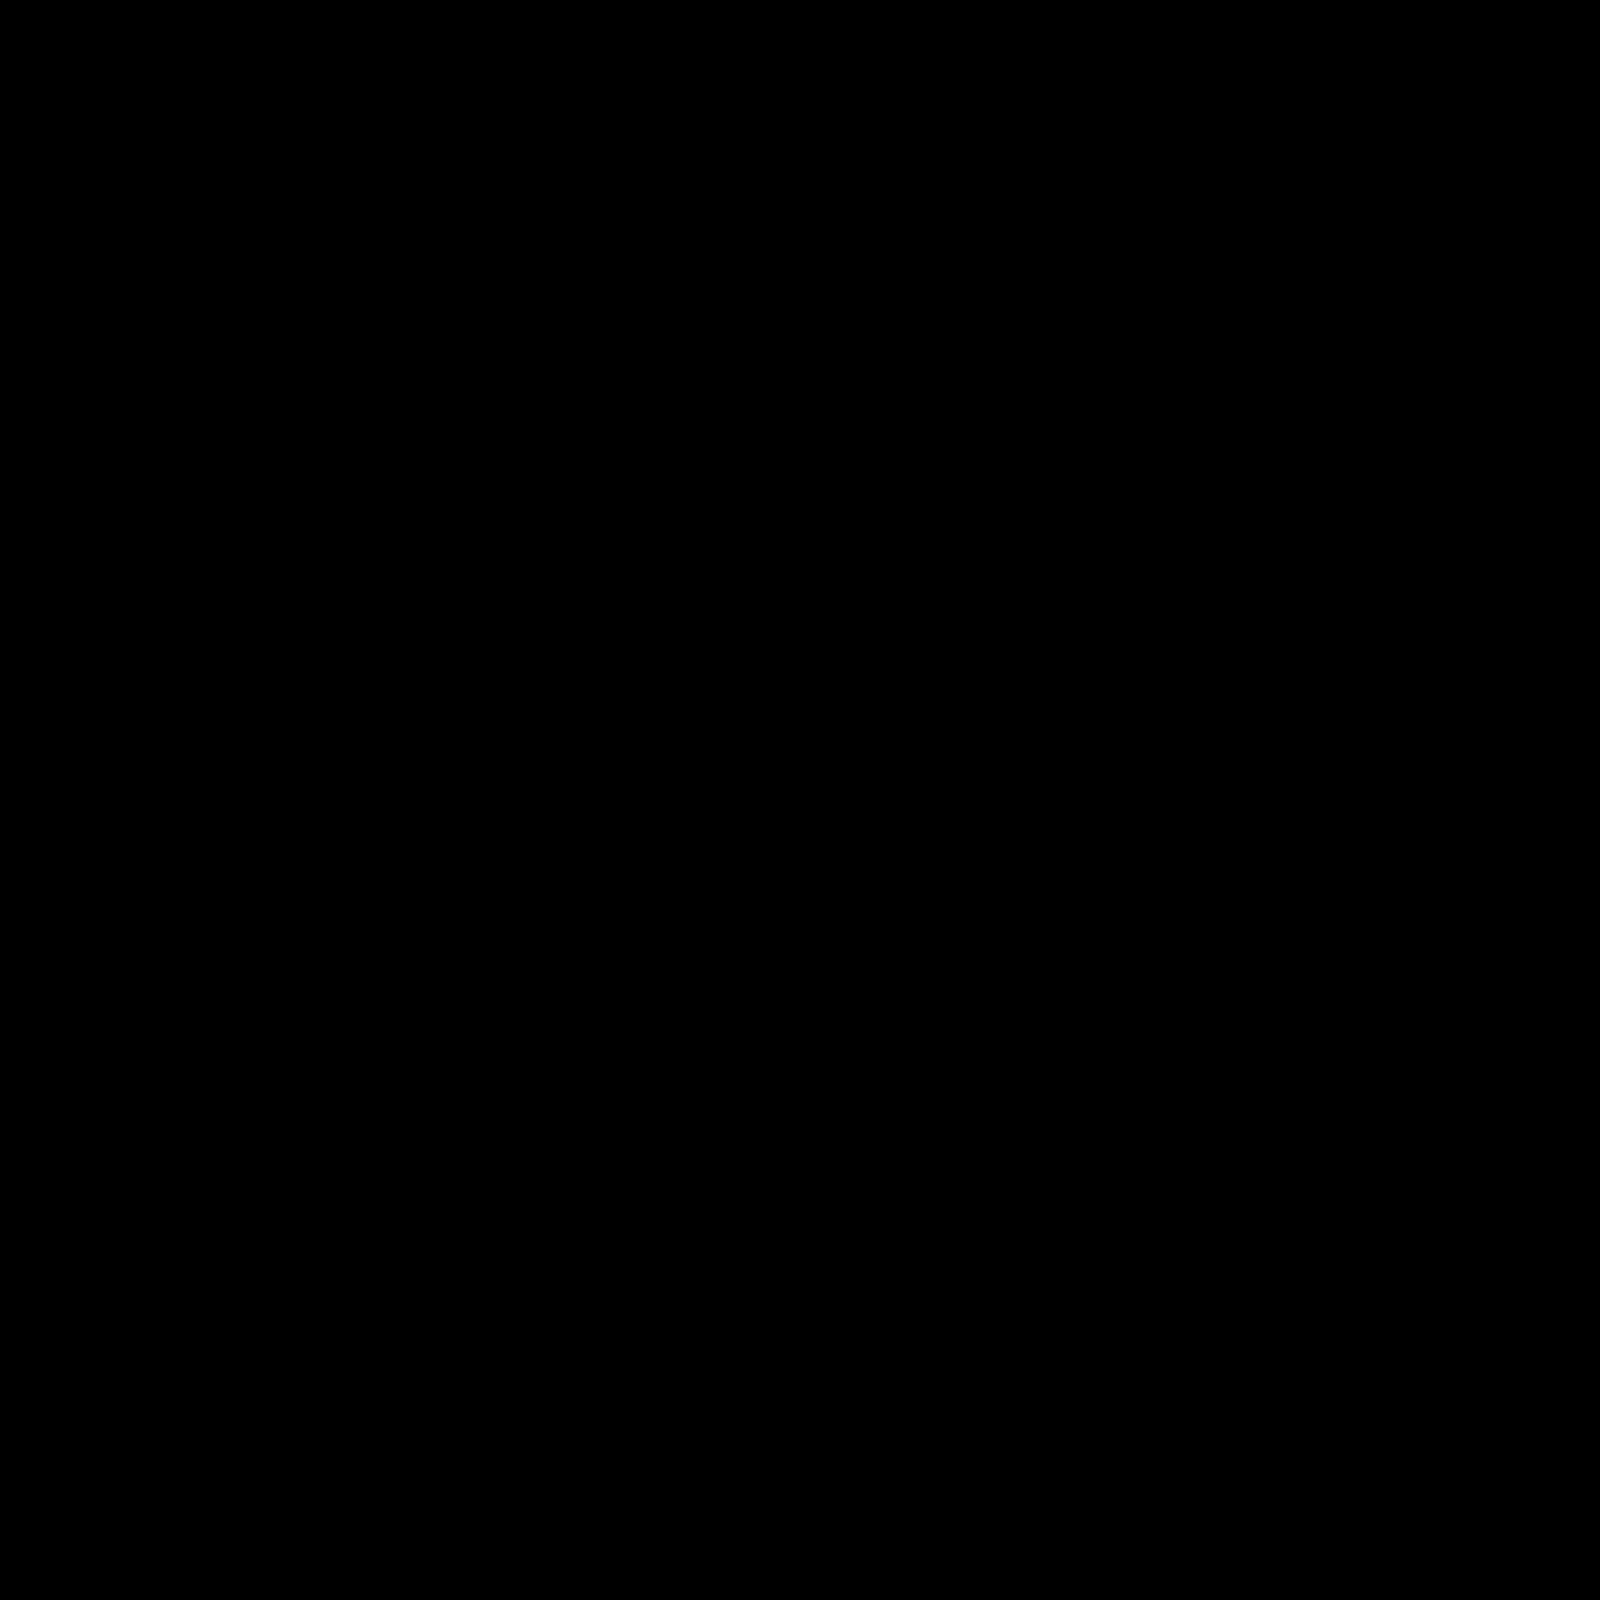 Rectángulo redondeado icon